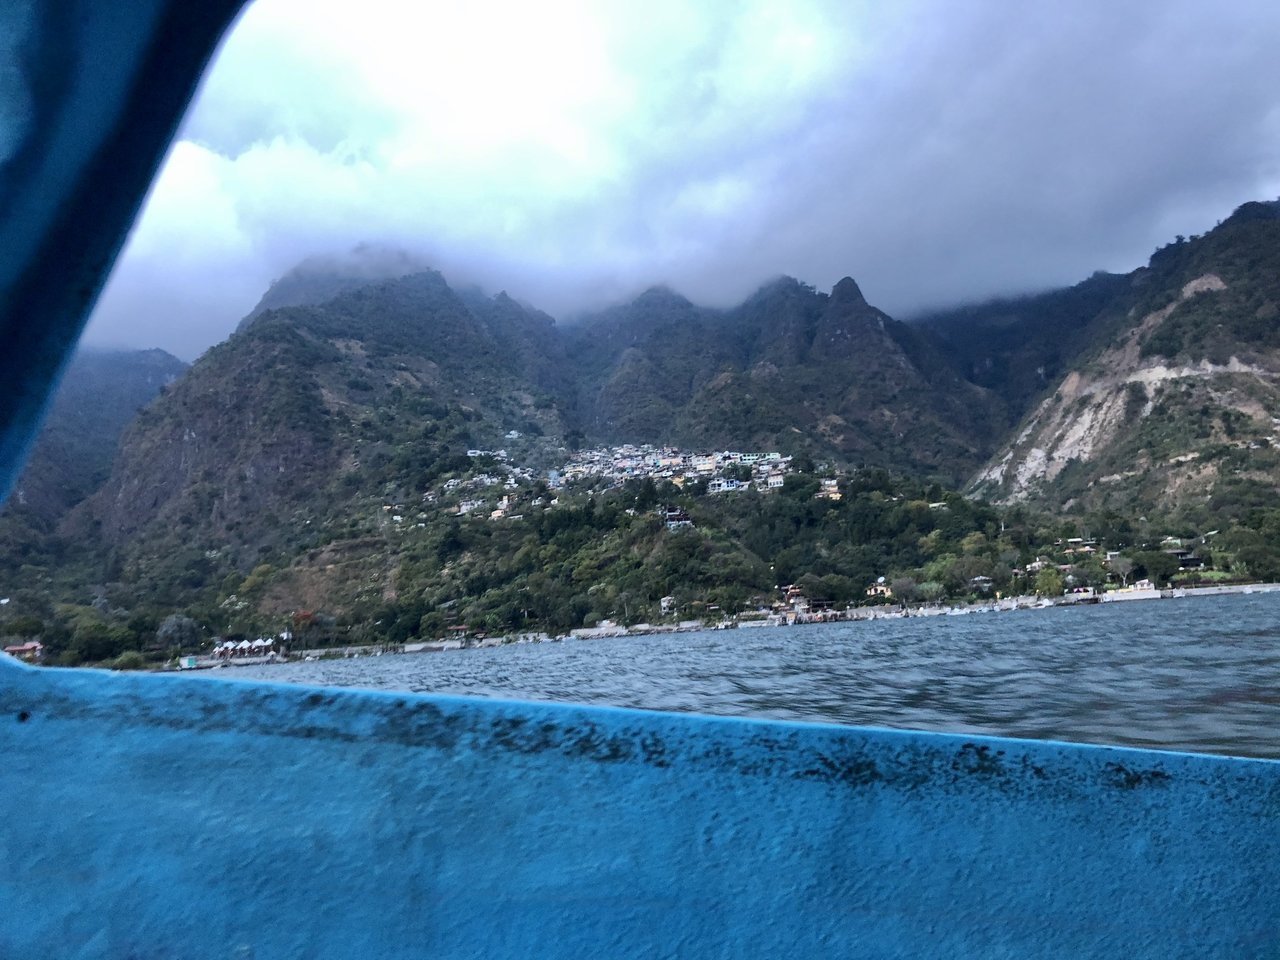 On a boat to Casas del Mundo  | Photo taken by BRAD K